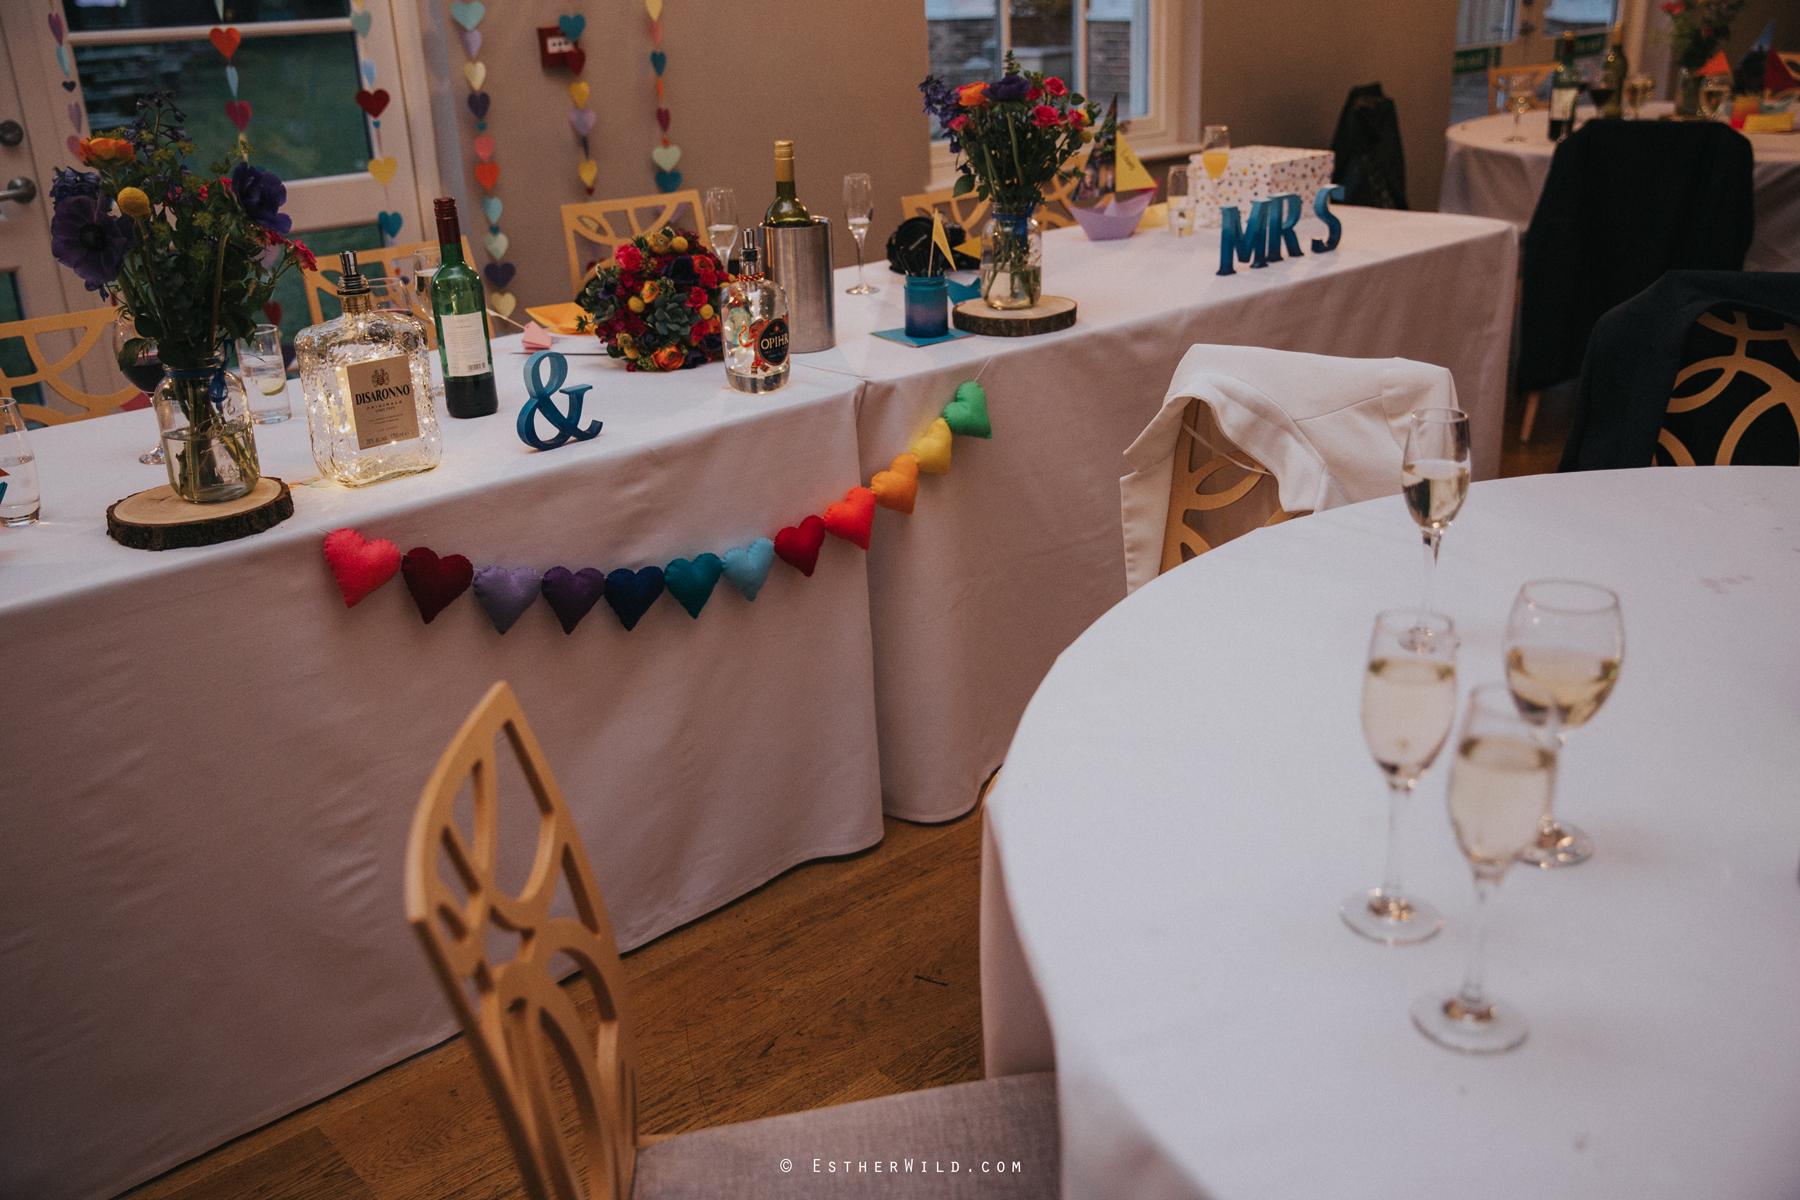 The_BoatHouse_Wedding_Venue_Ormesby_Norfolk_Broads_Boat_Wedding_Photography_Esther_Wild_Photographer_IMG_3335.jpg